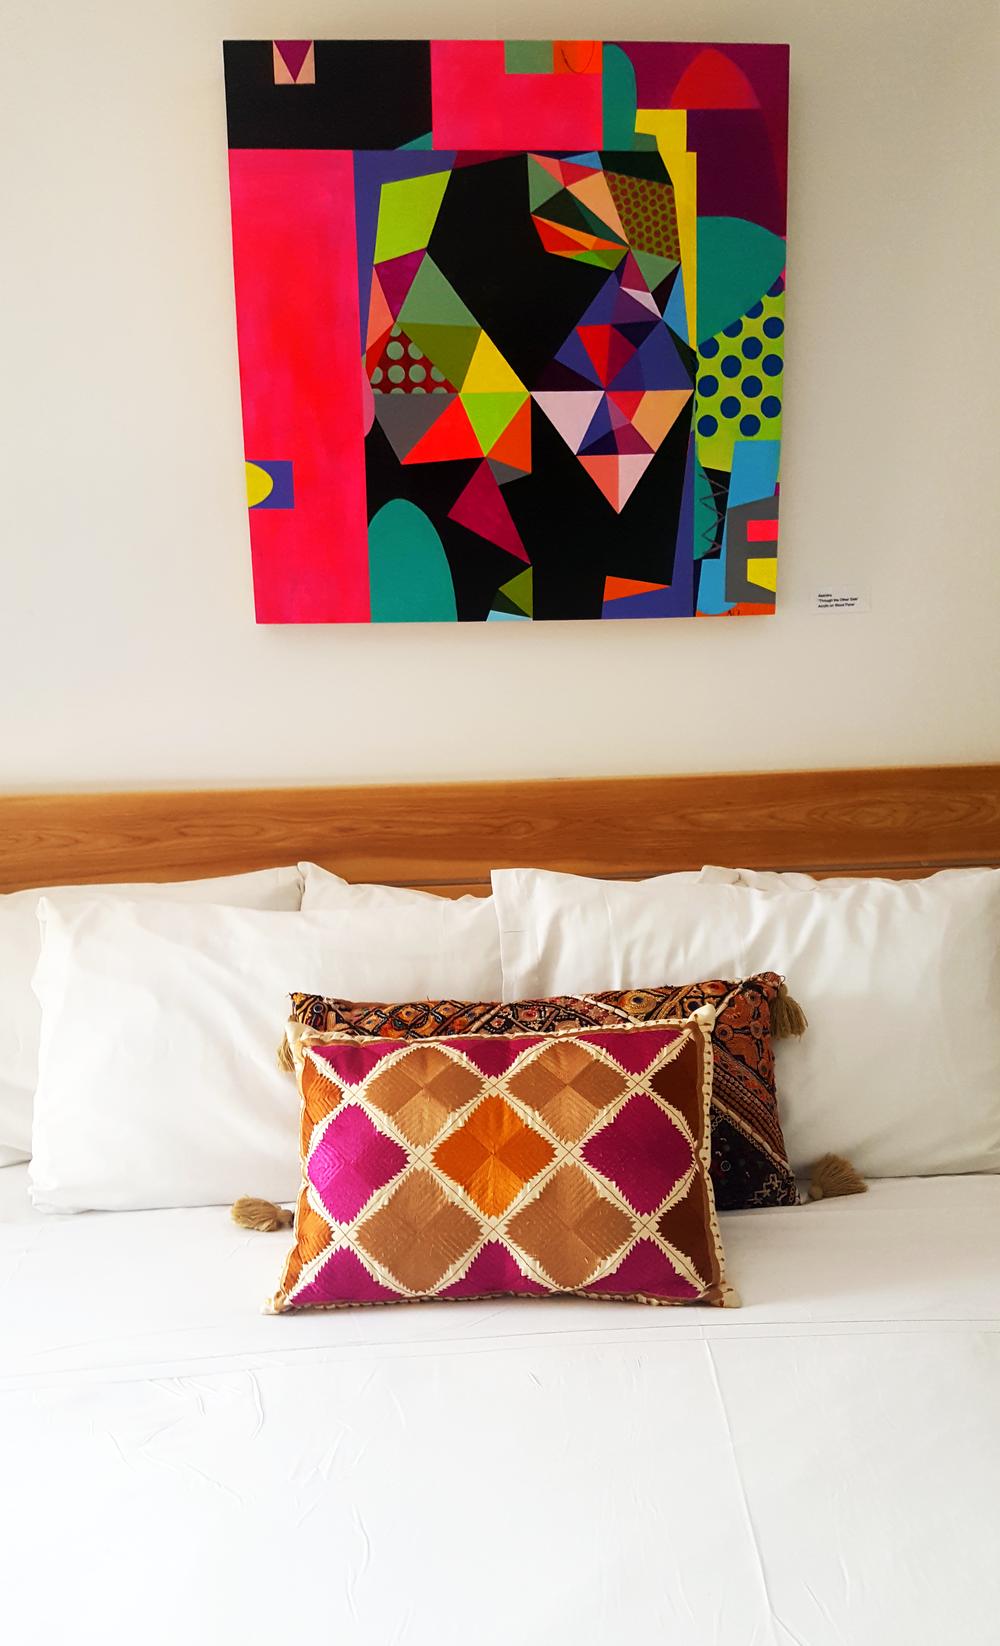 Asandra's geometric painting